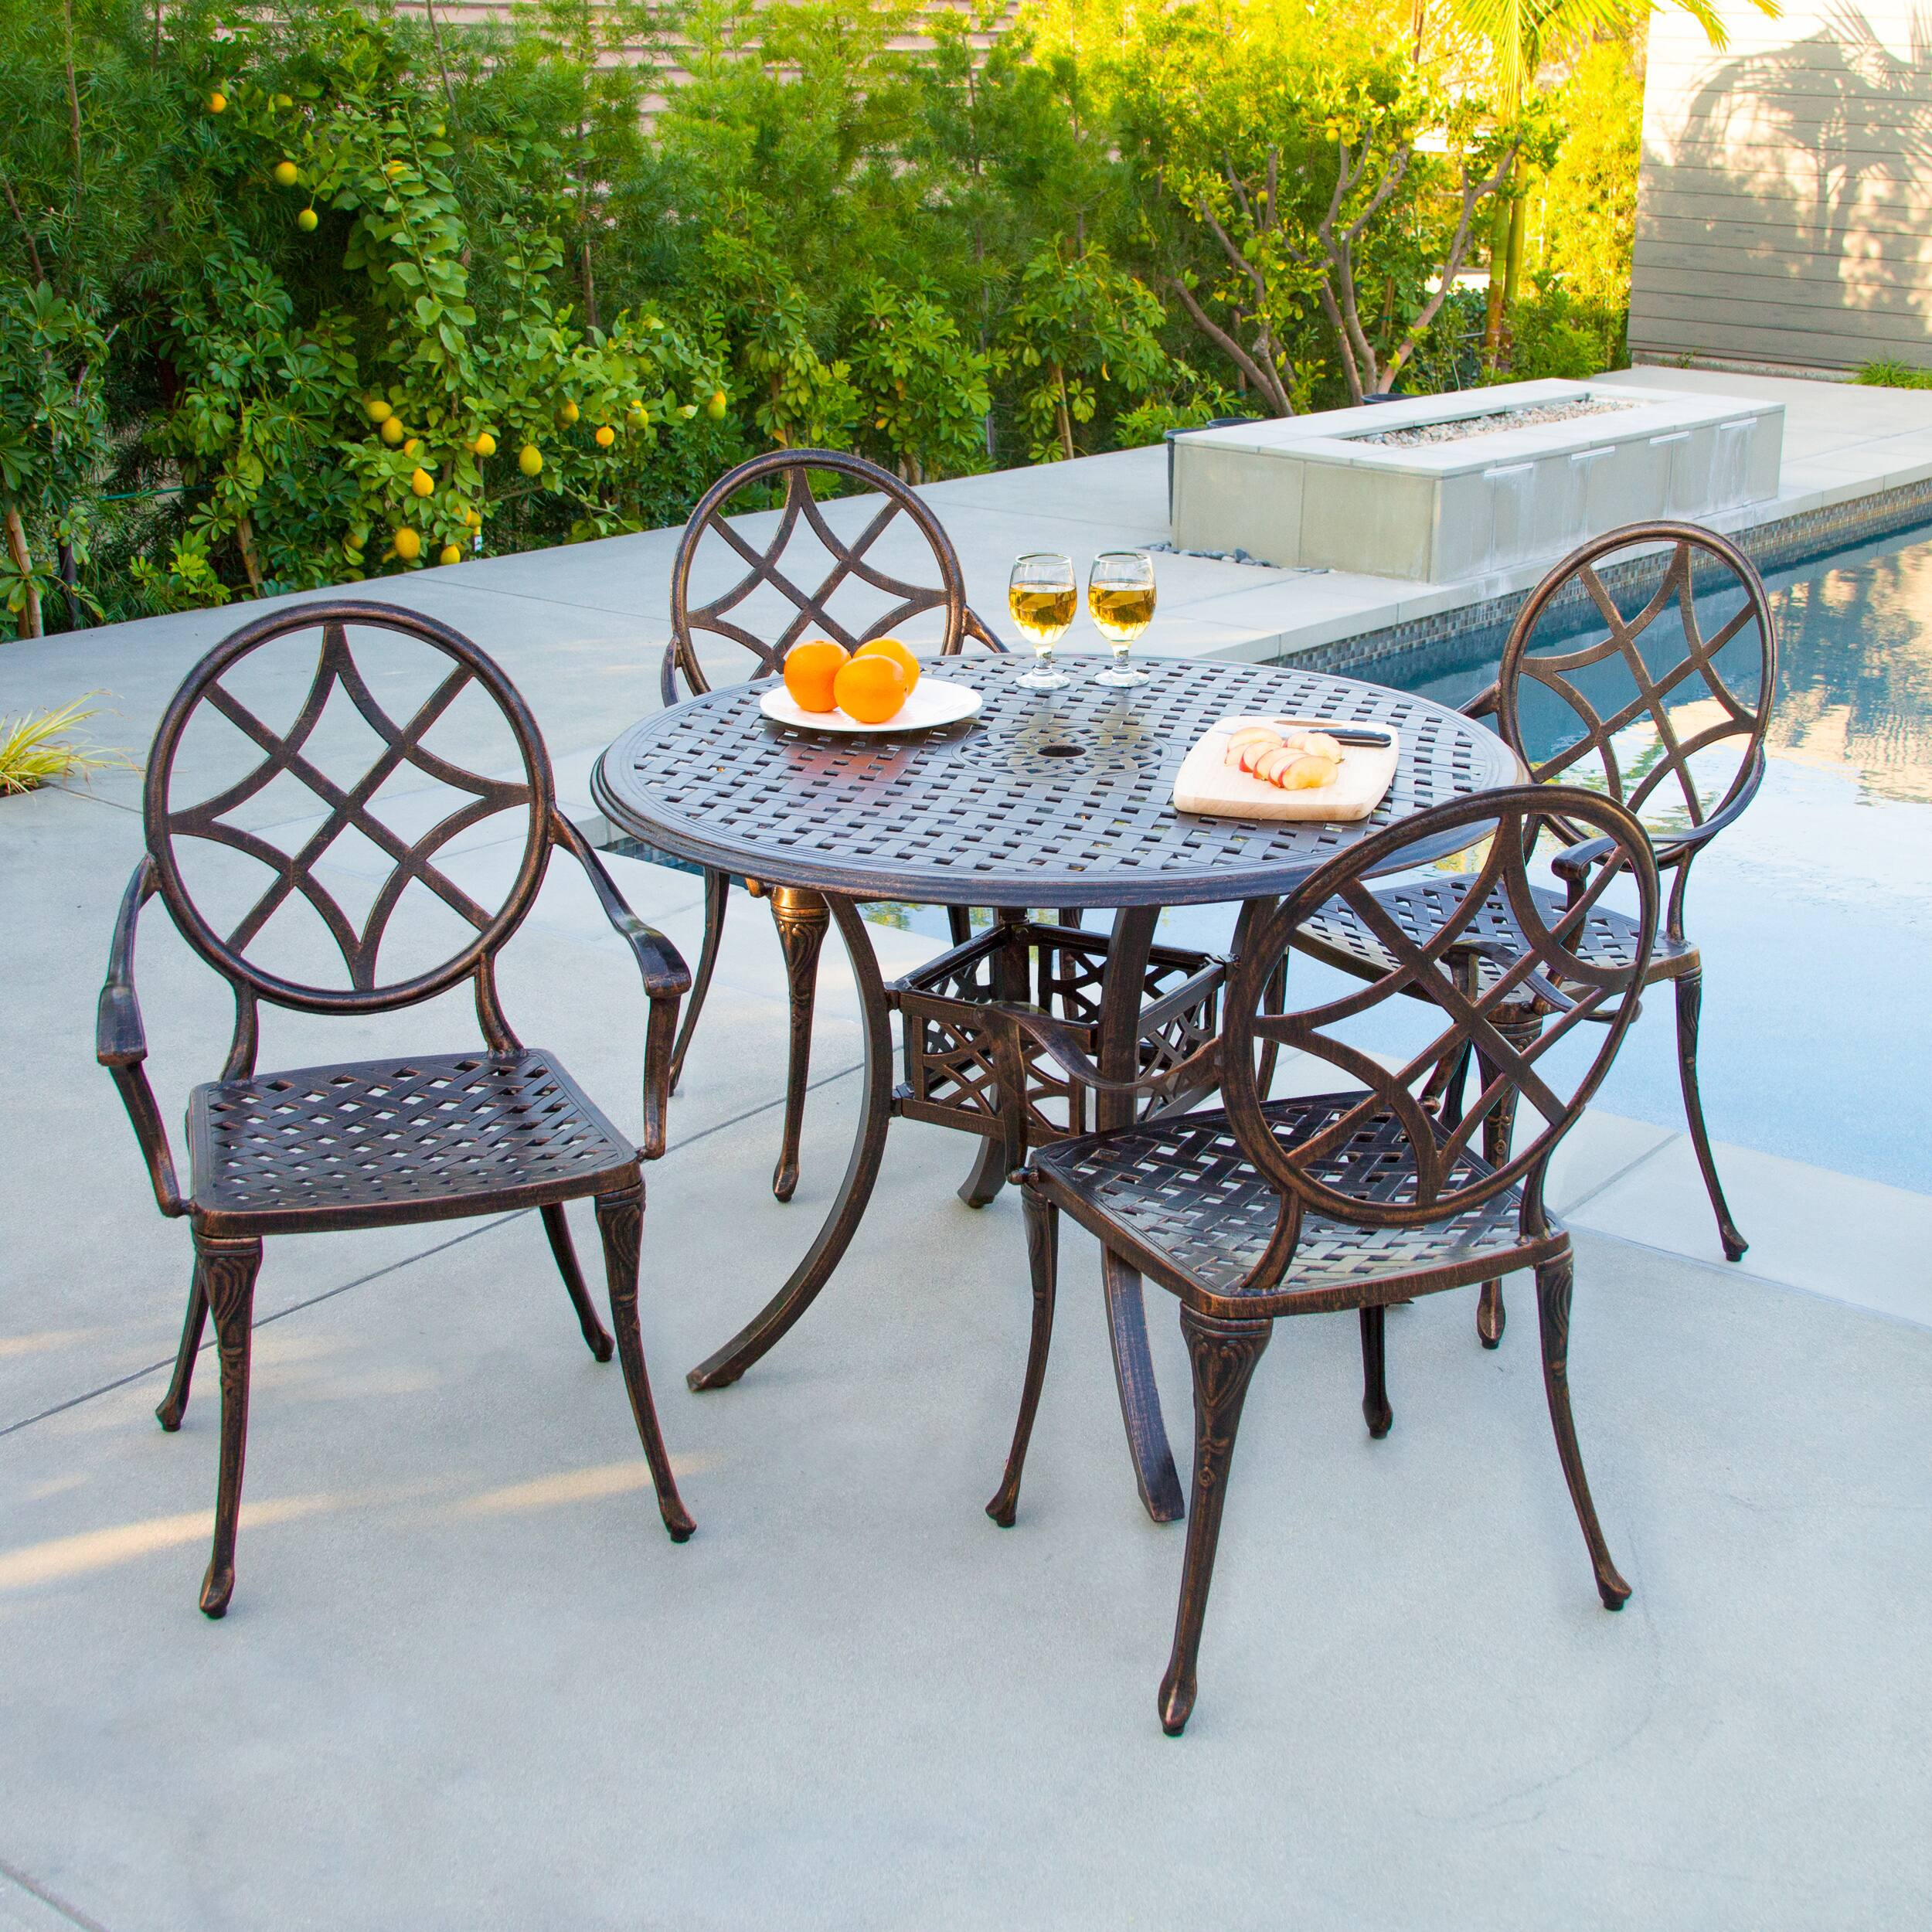 Furniture Liquidation Deals at Overstock